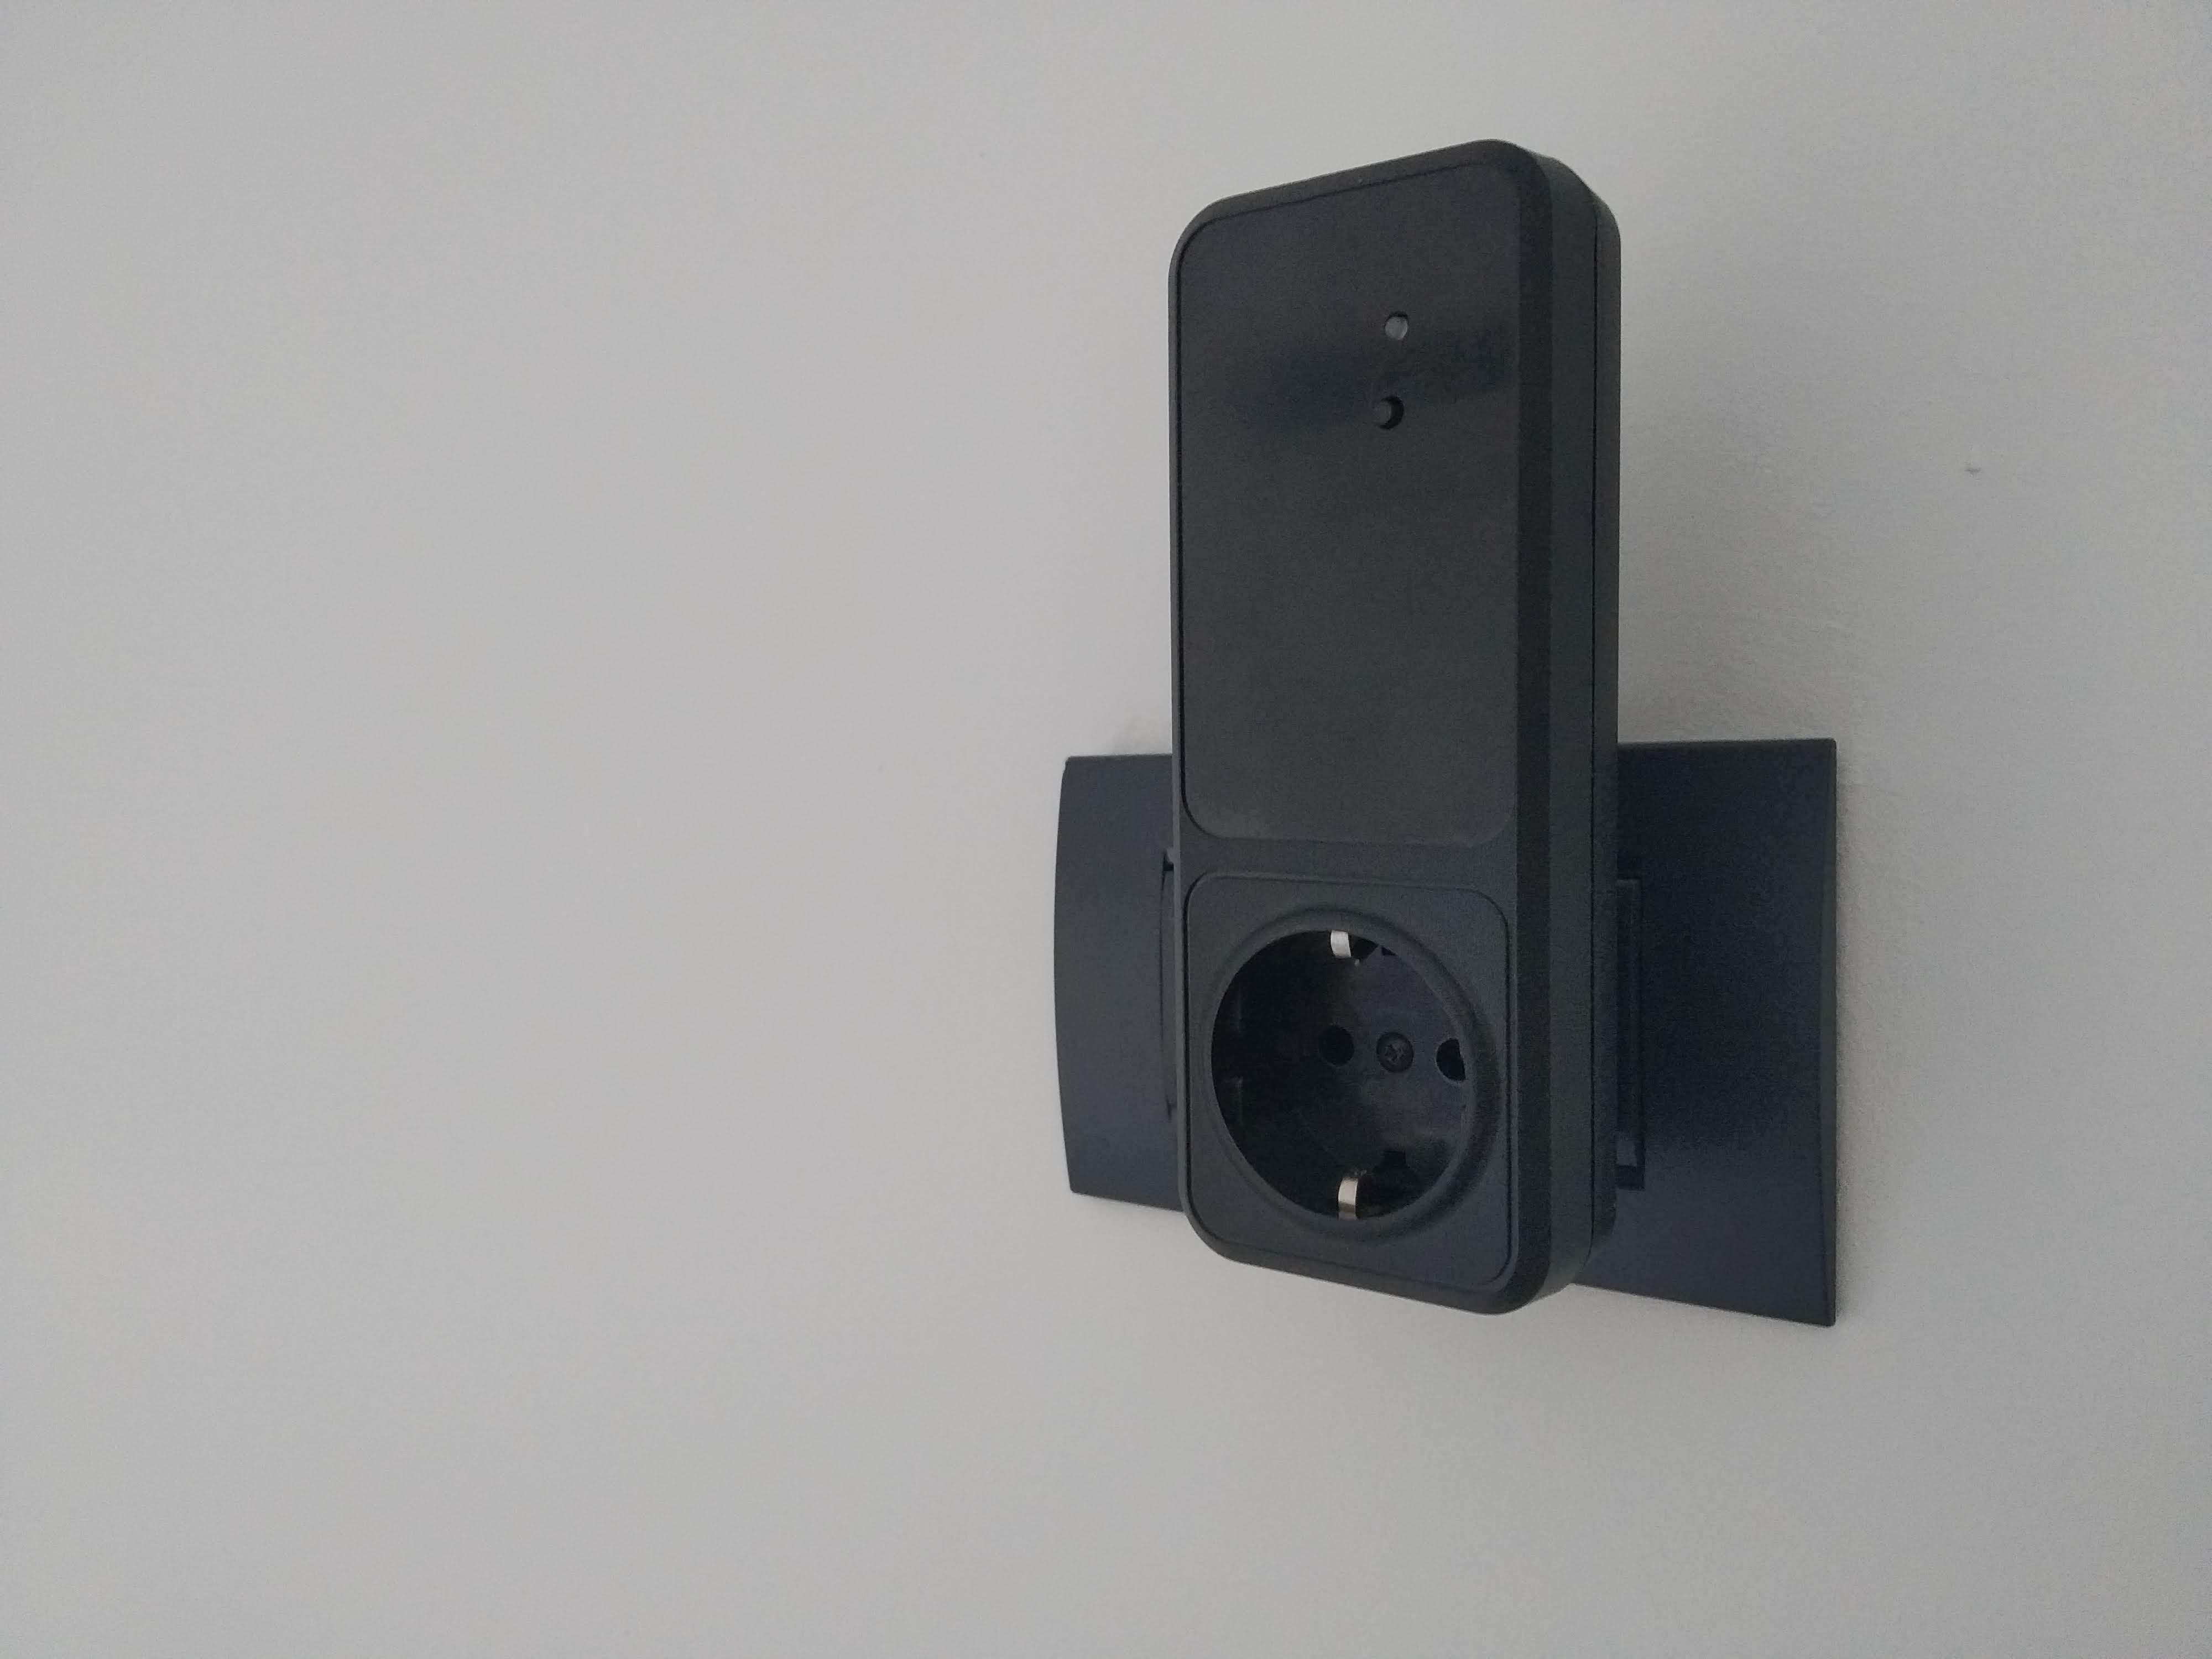 Case Mini Box Module WiFi Wall Plug Smart Electrical Socket Accessory Automation Home EU Smart iot Esp8266 Relay 220V AC